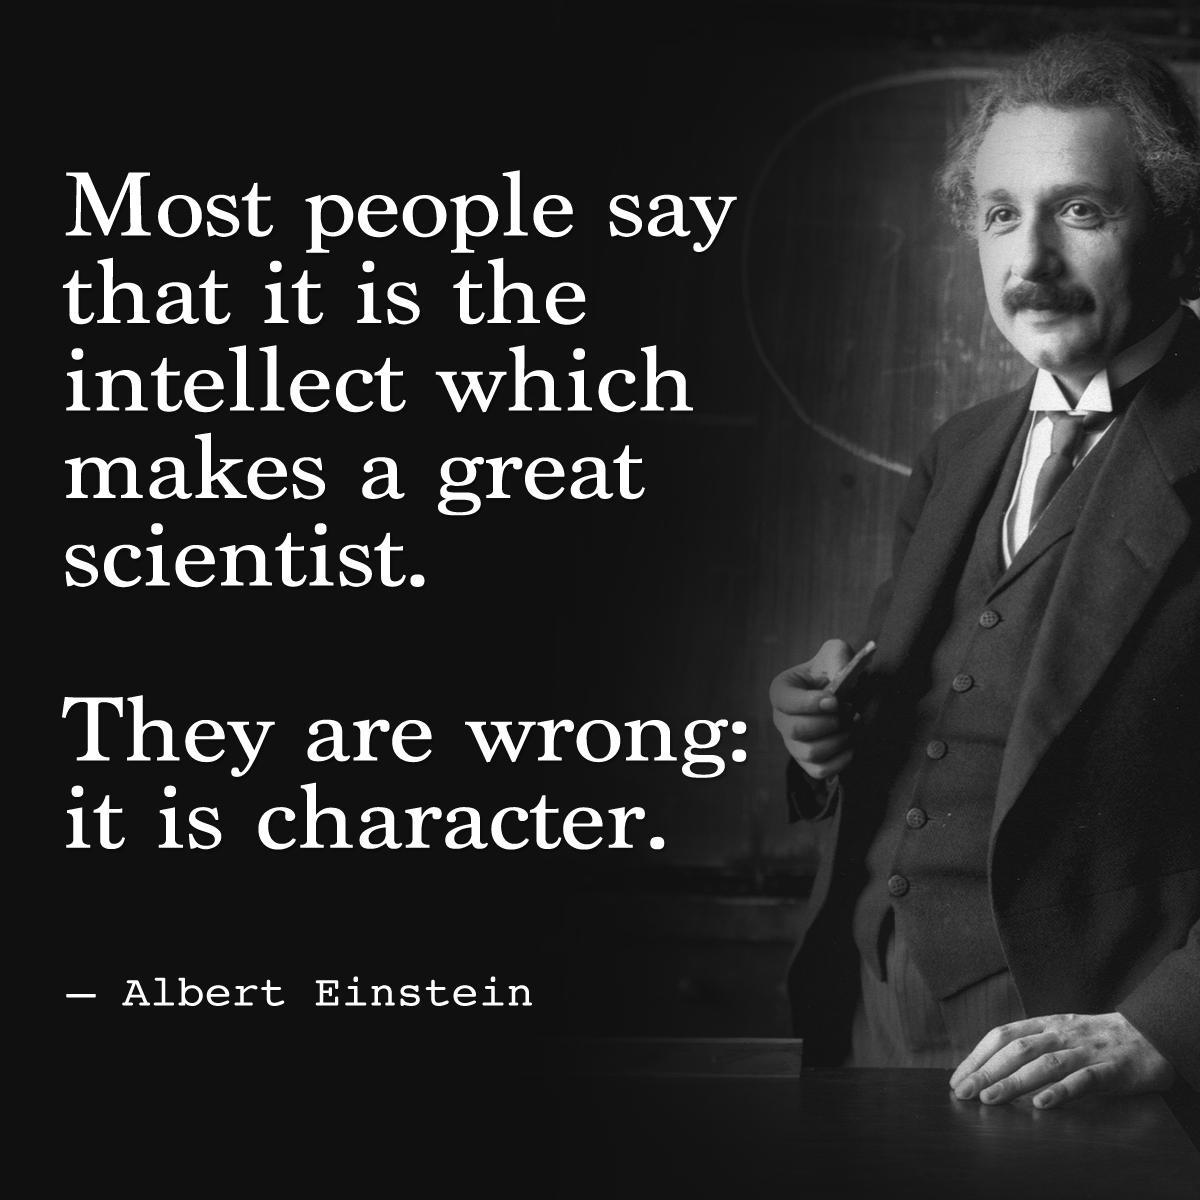 Quotes Said By Albert Einstein: Yara Mohajerani (@_Y_A_R_A__)